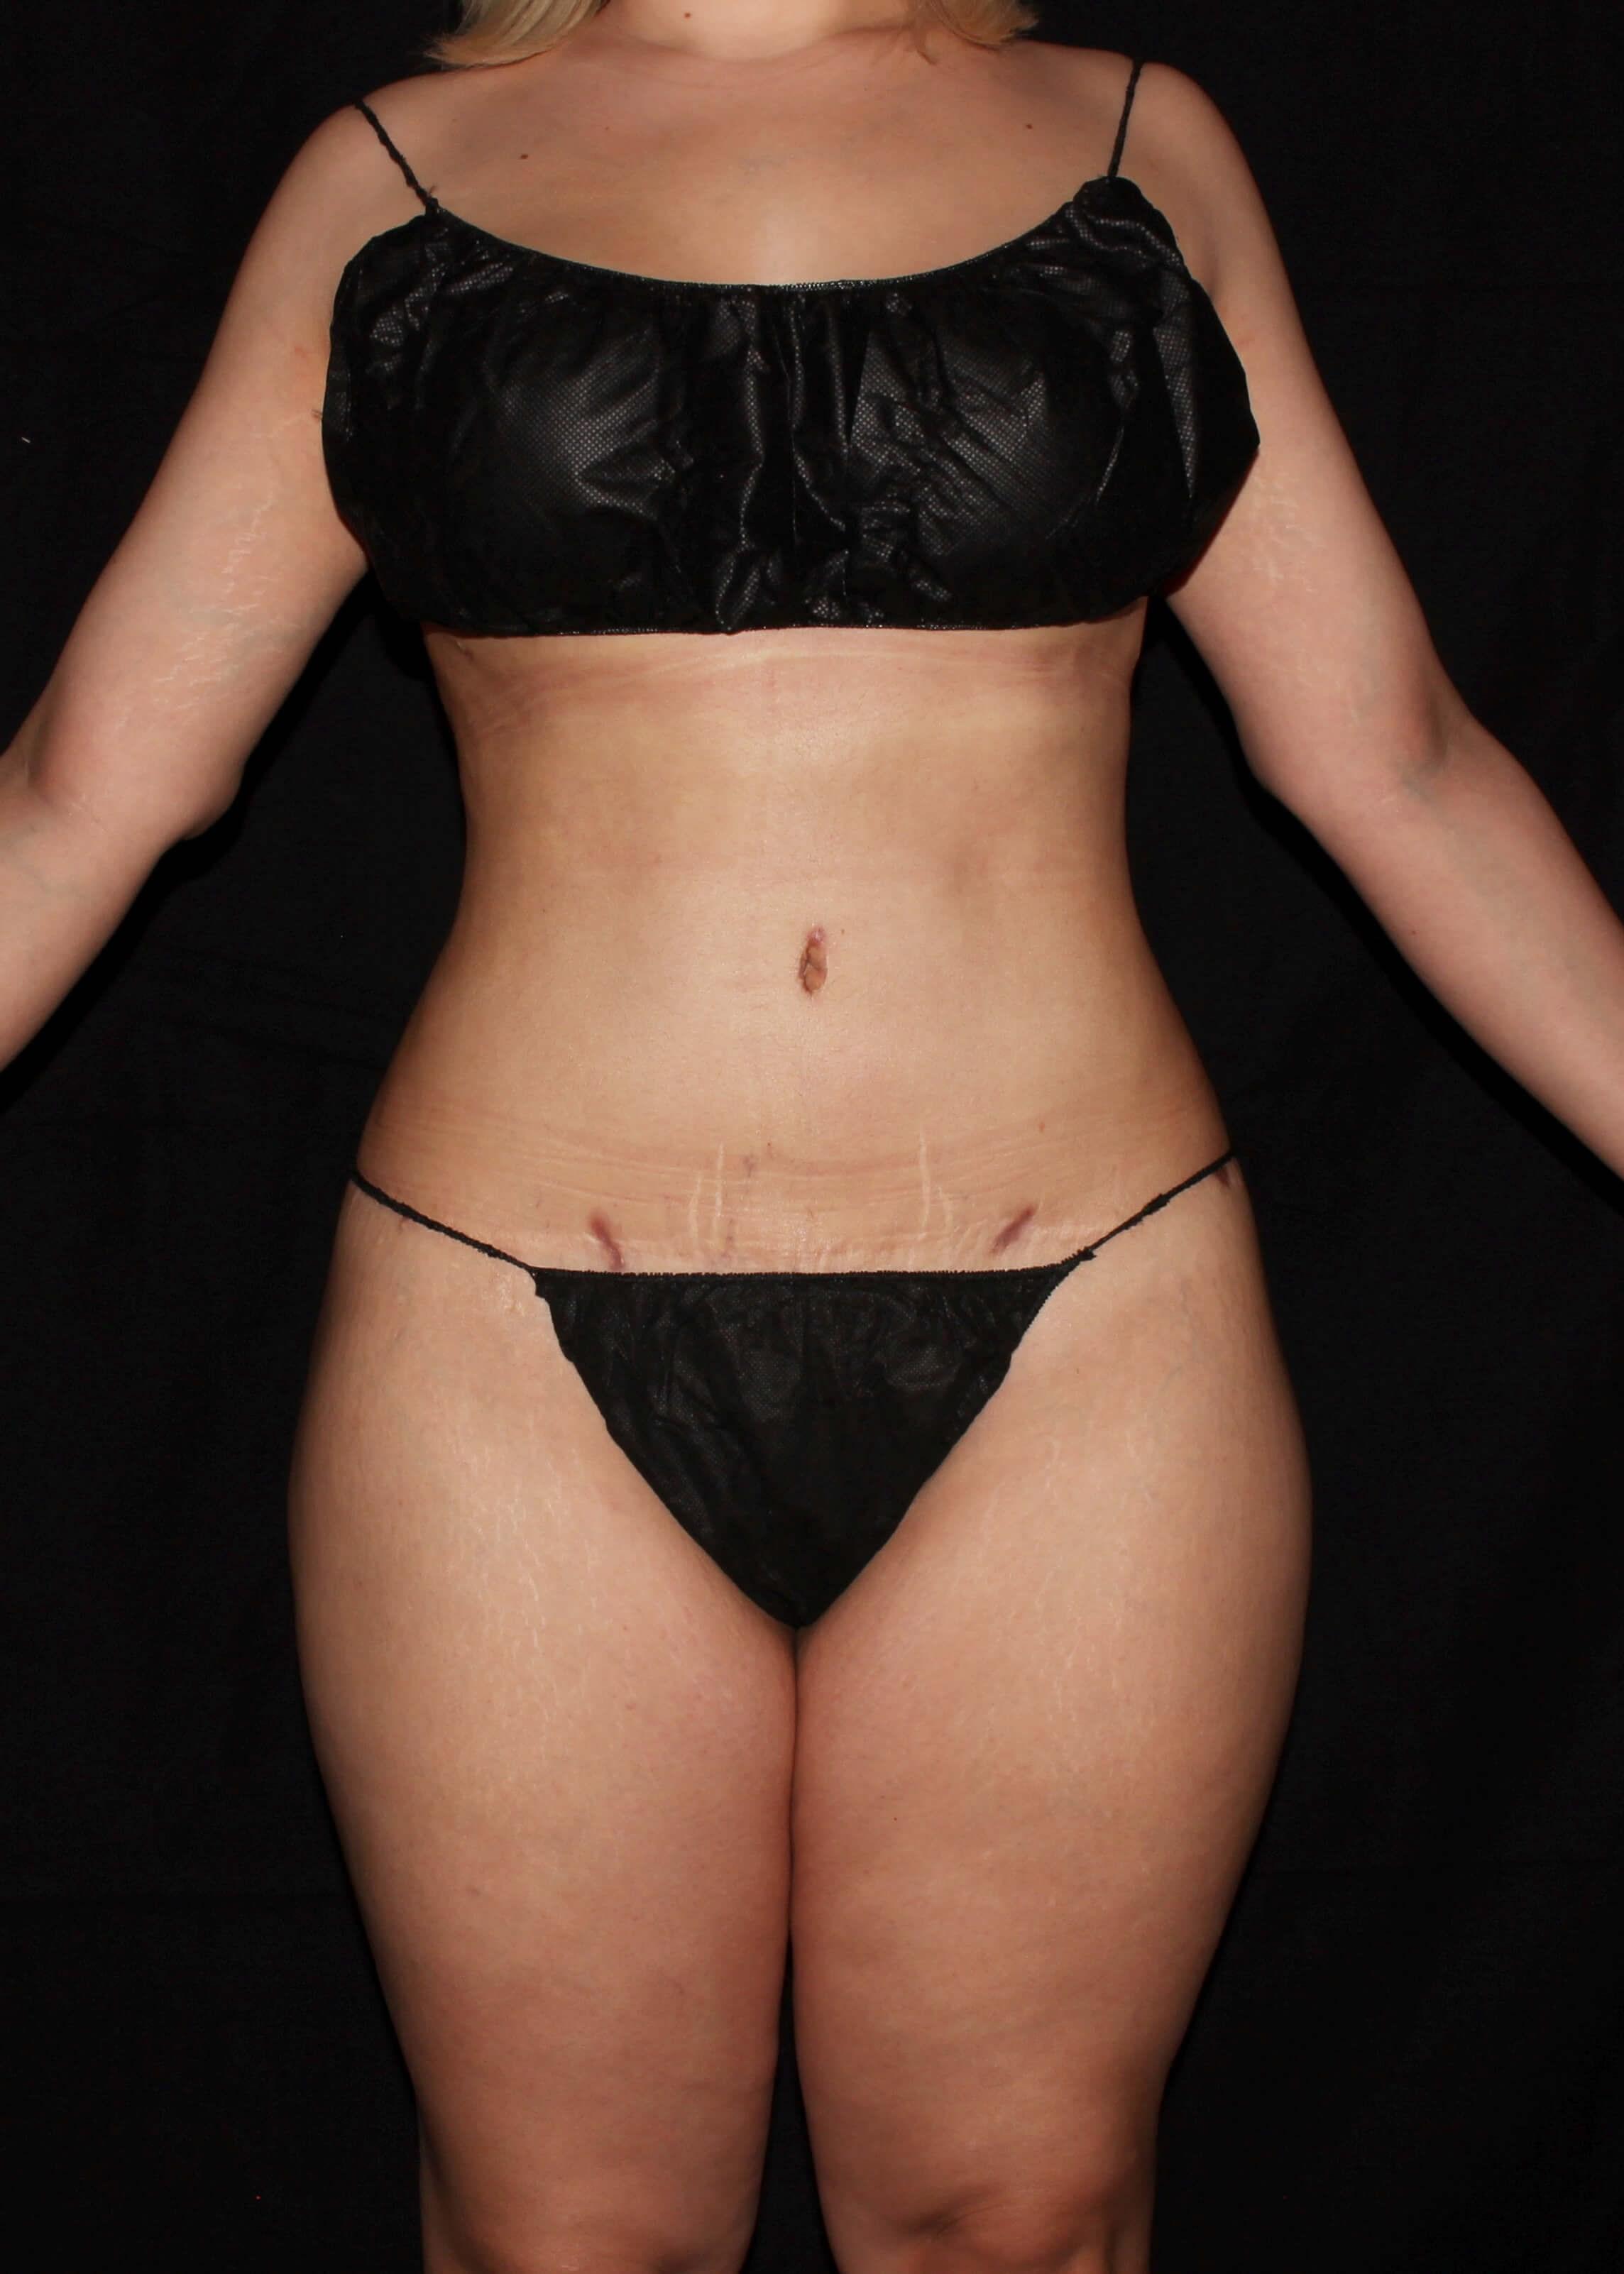 Full Torso Liposuction After - Full Torso Liposuction